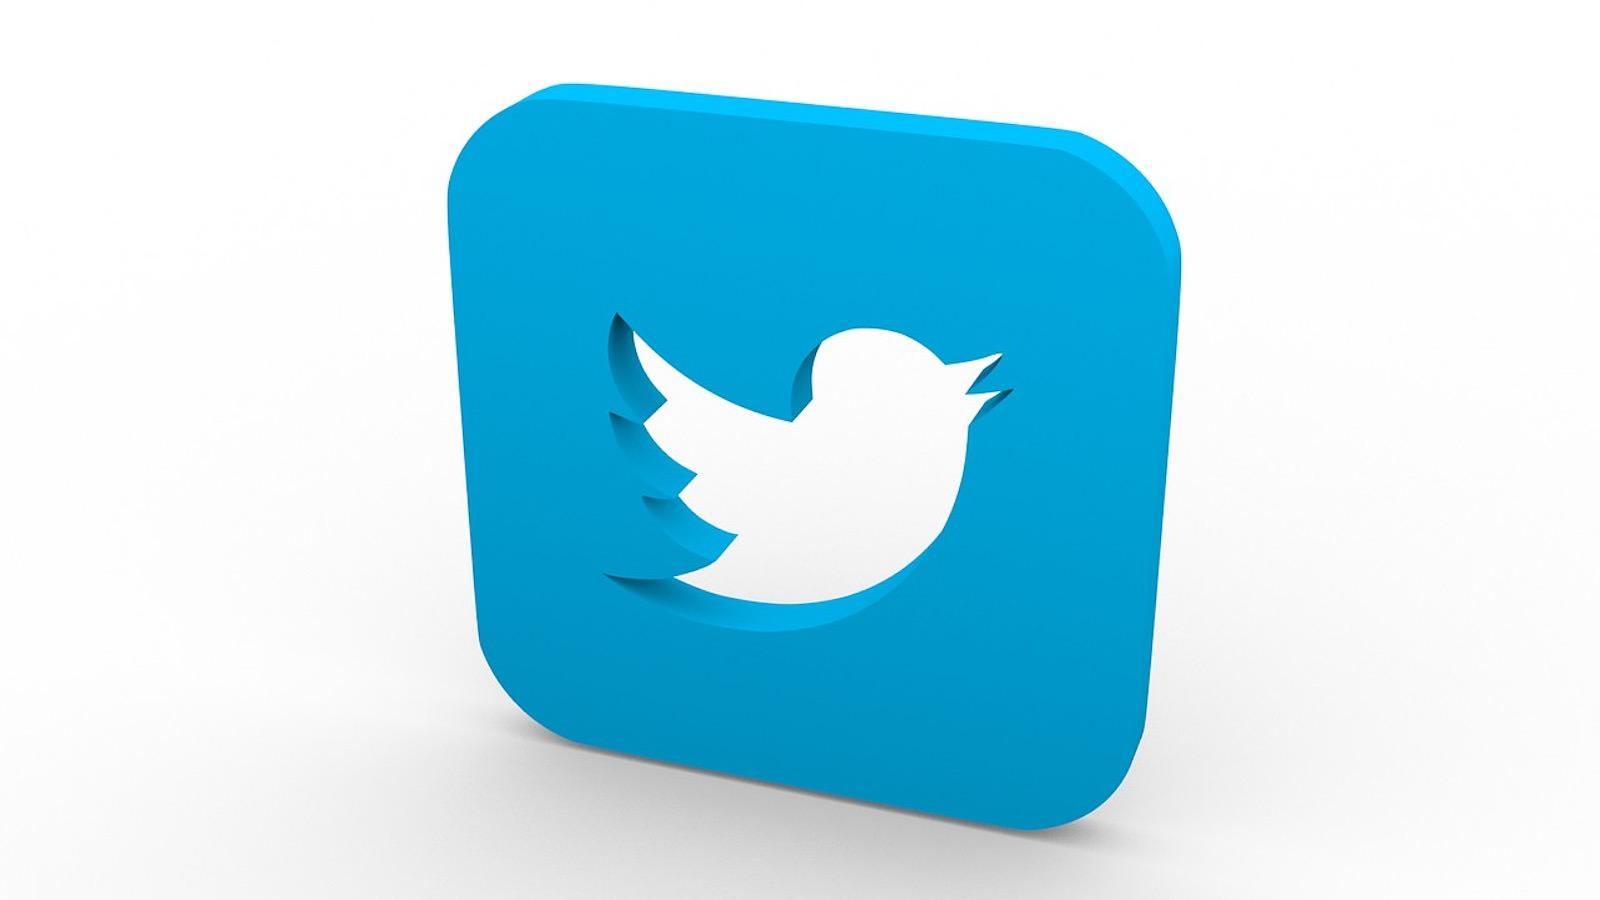 Twitter 1848505 1280